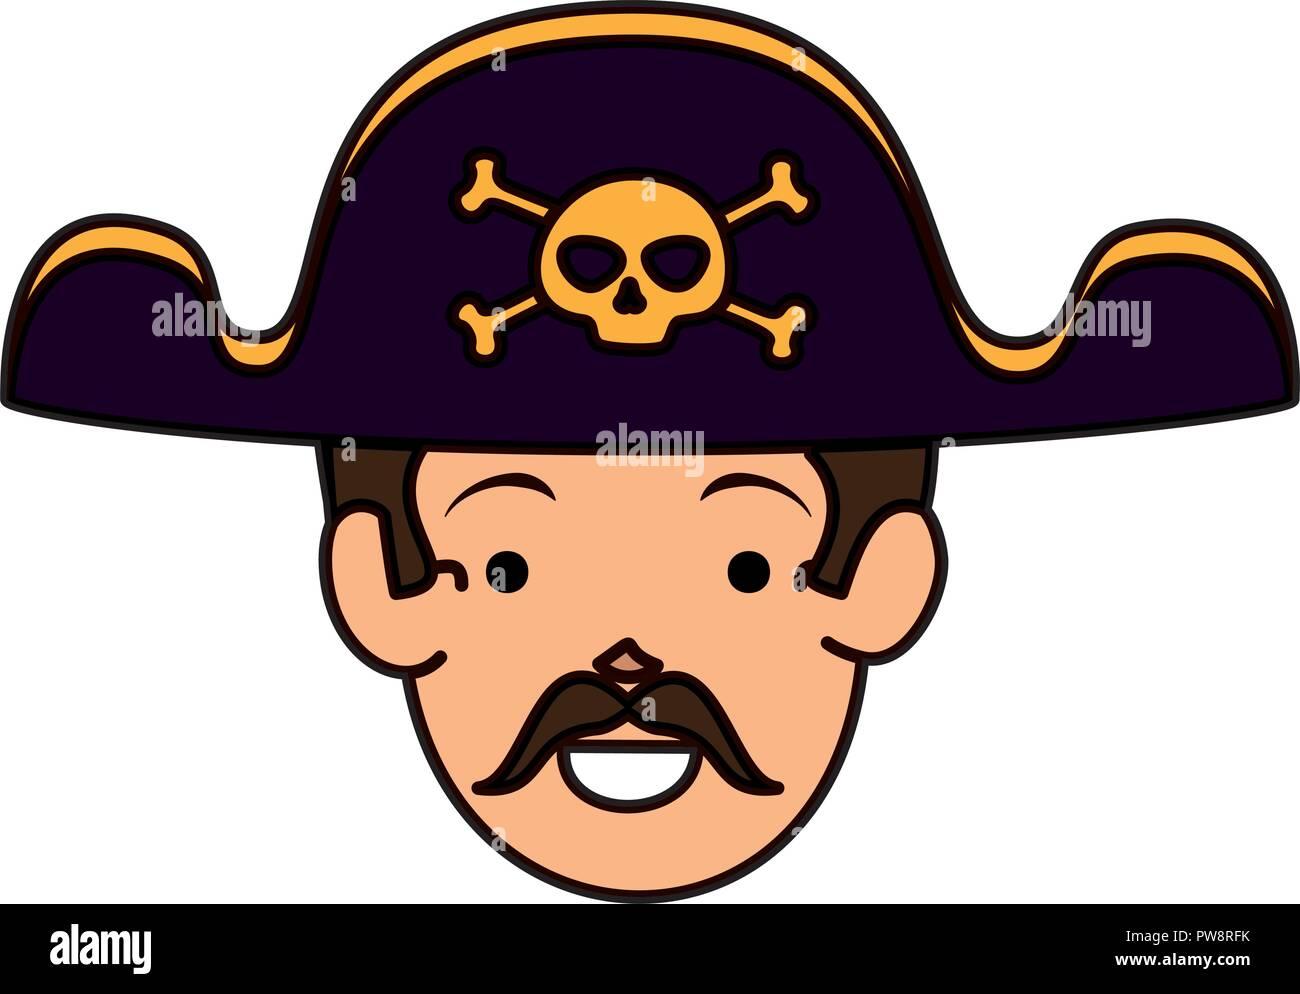 1×Kids Halloween Pirate Skull /& Crossbones Sea Ship Captain Hat Eye Patch Beard